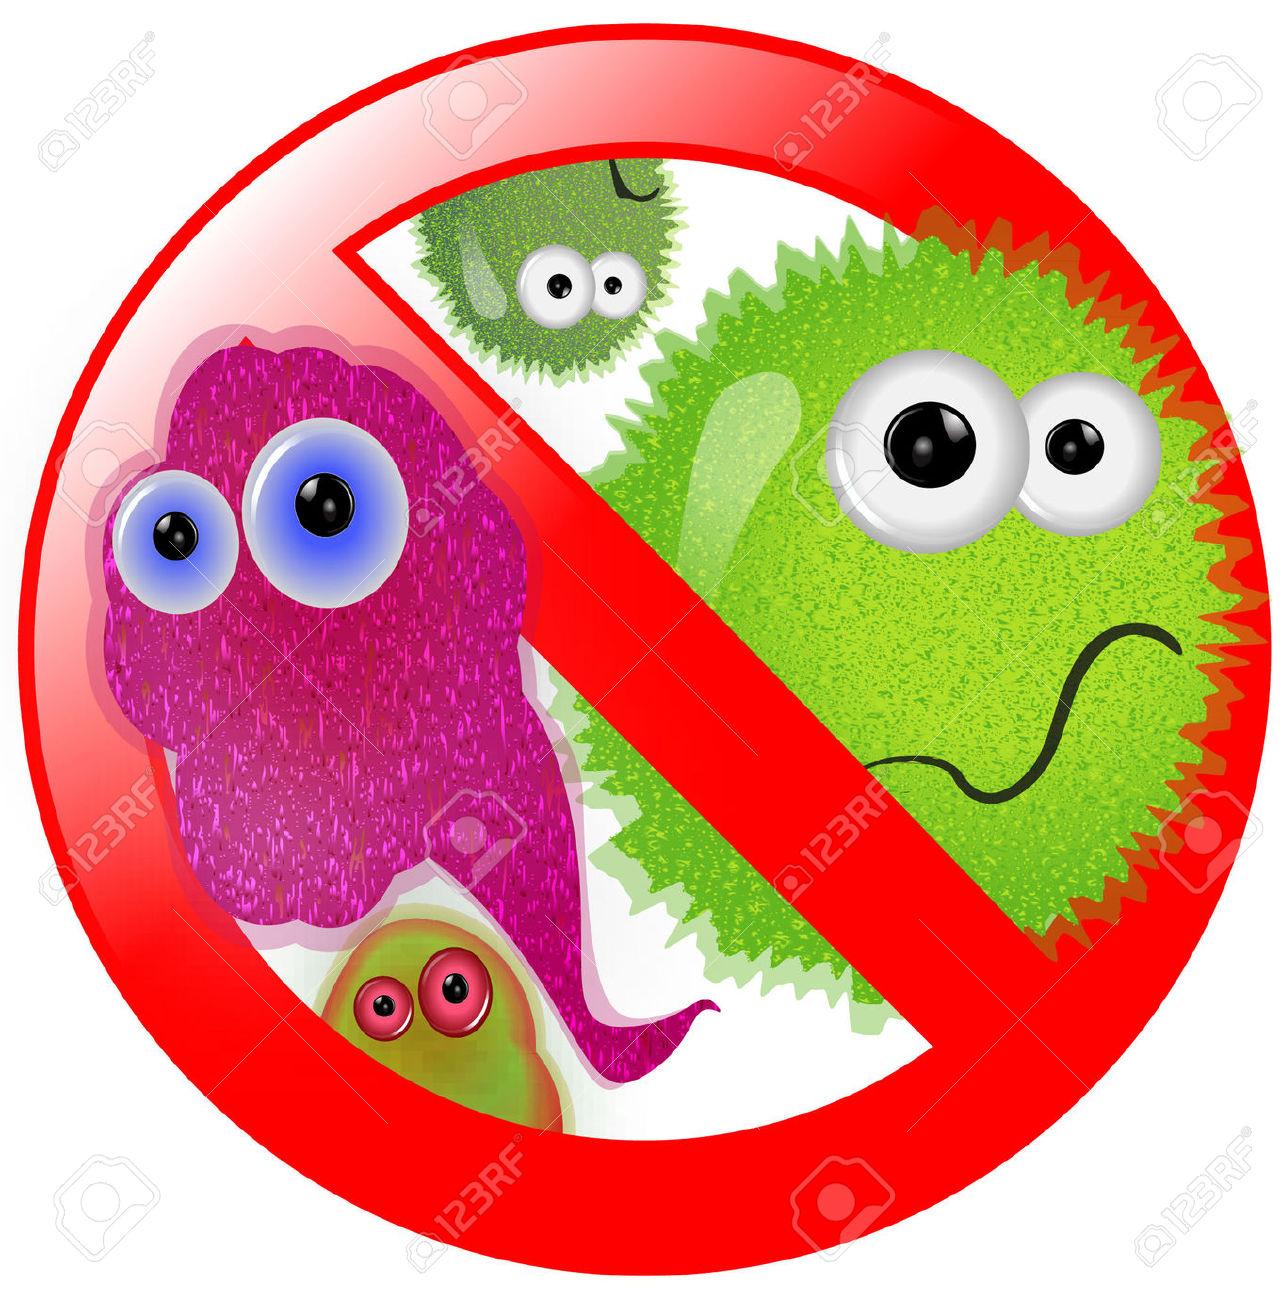 No Germs Clipart #1-No Germs Clipart #1-7